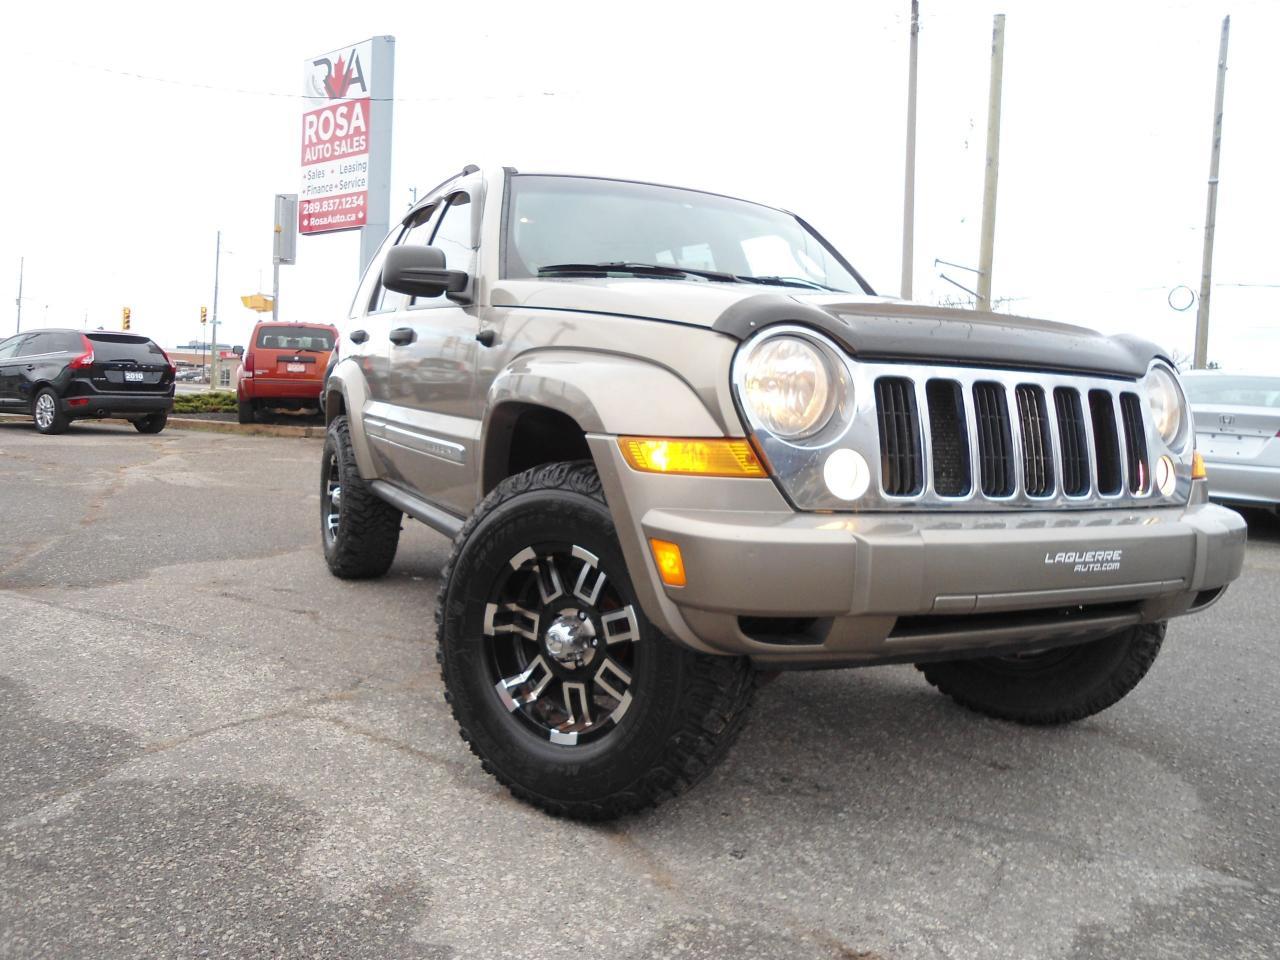 Photo of Gold 2005 Jeep Liberty